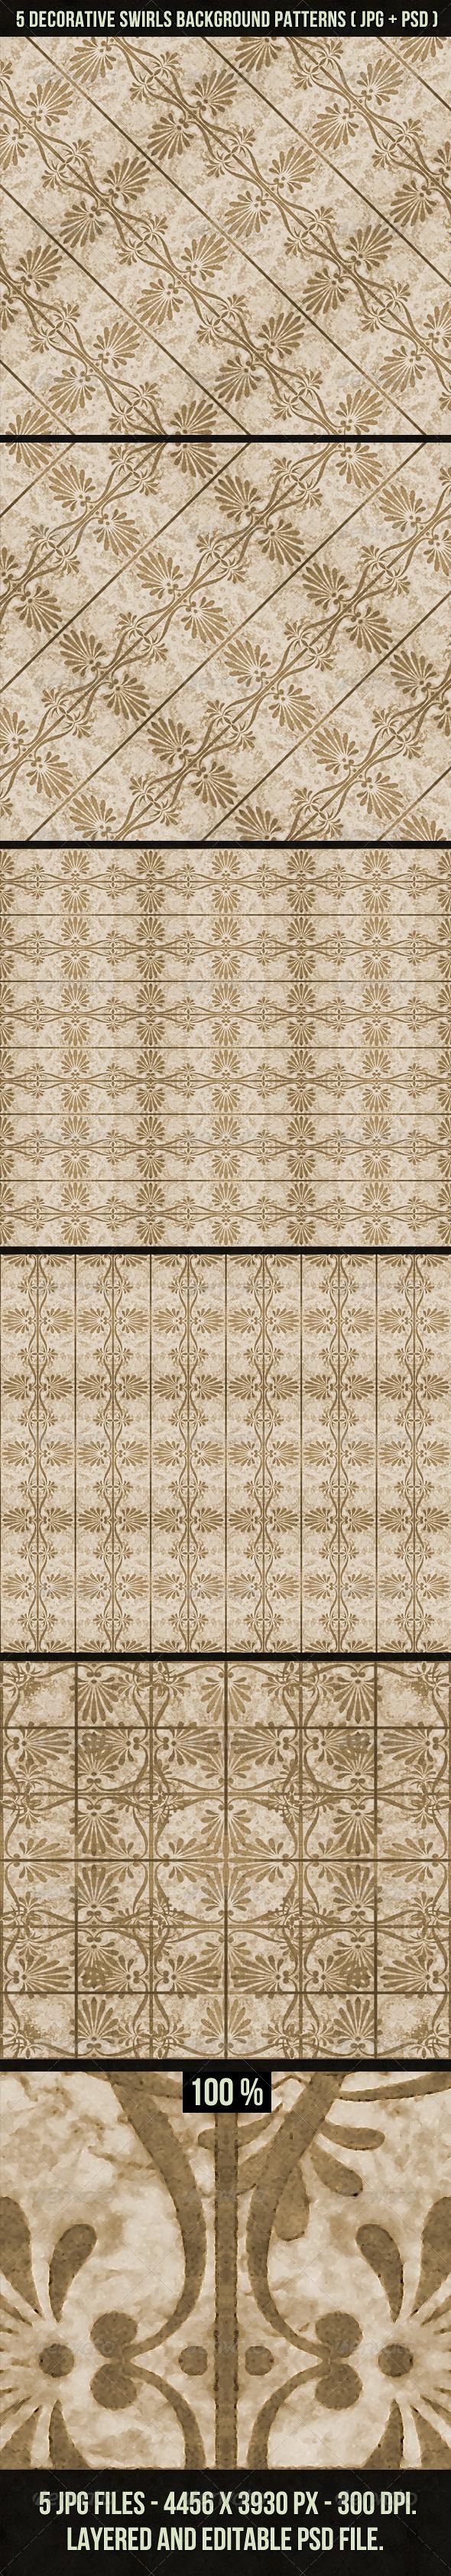 5 Decorative Swirls Background Patterns - Patterns Backgrounds